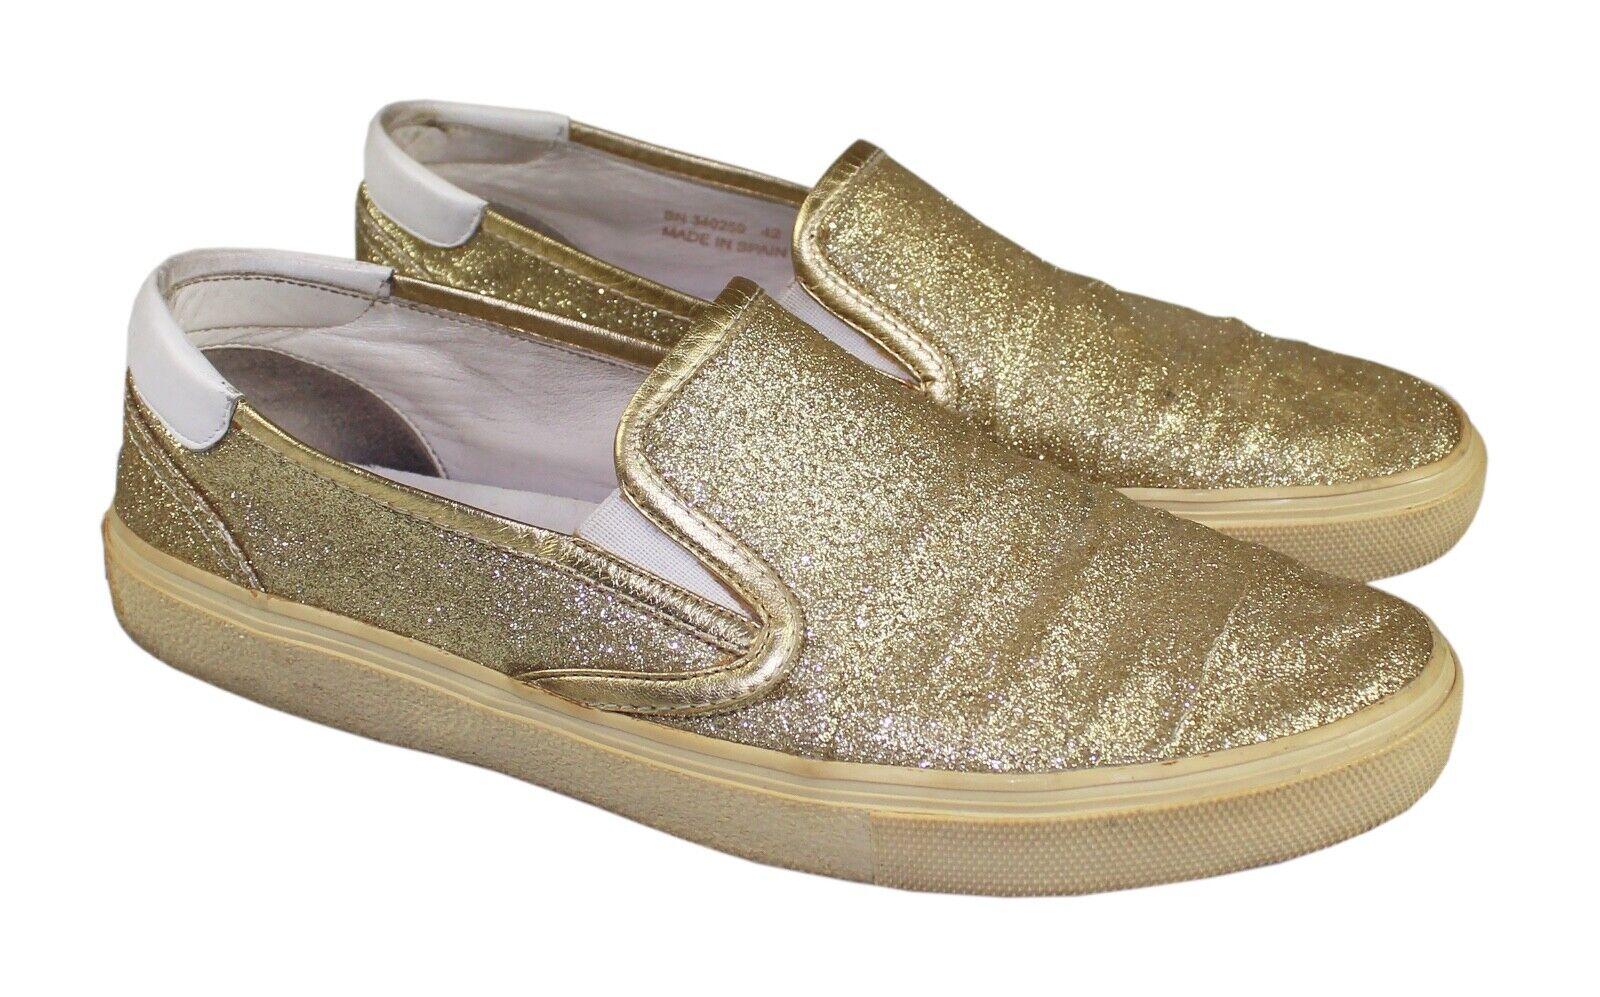 Men's SAINT LAURENT YSL Gold Glitter & Leather Low Top Slip-On Sneakers 42 / 9